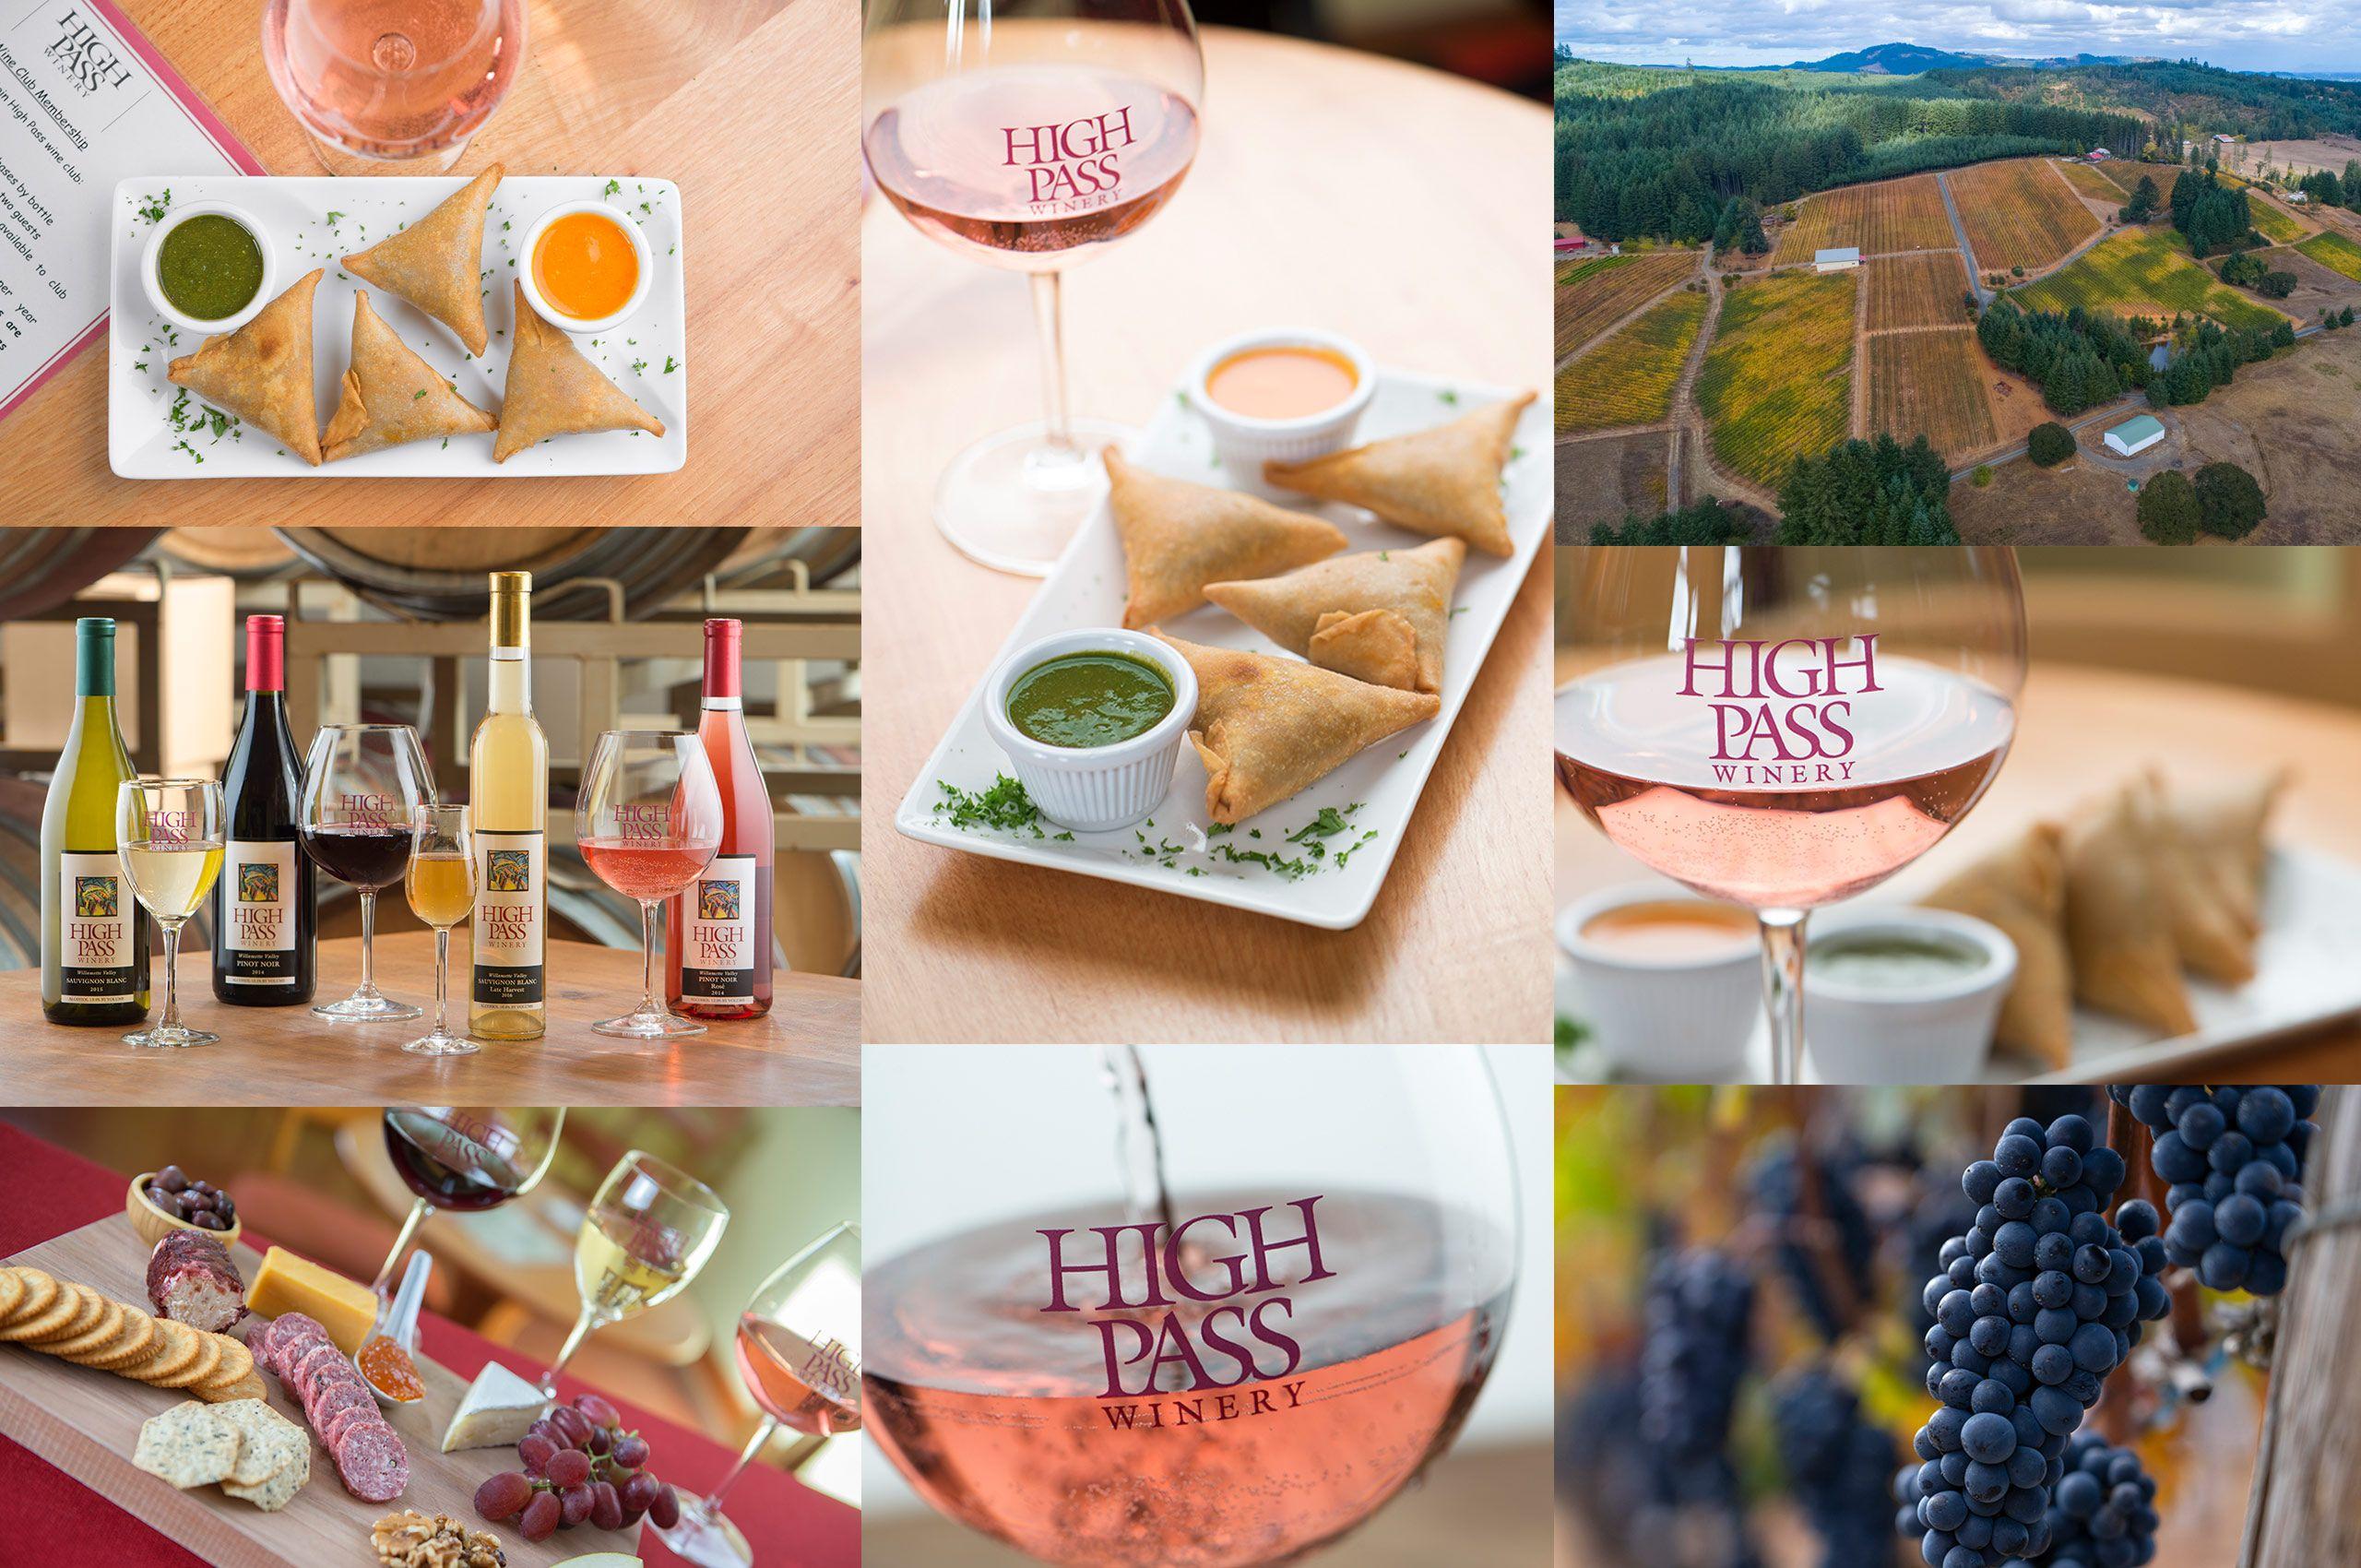 High Pass Winery